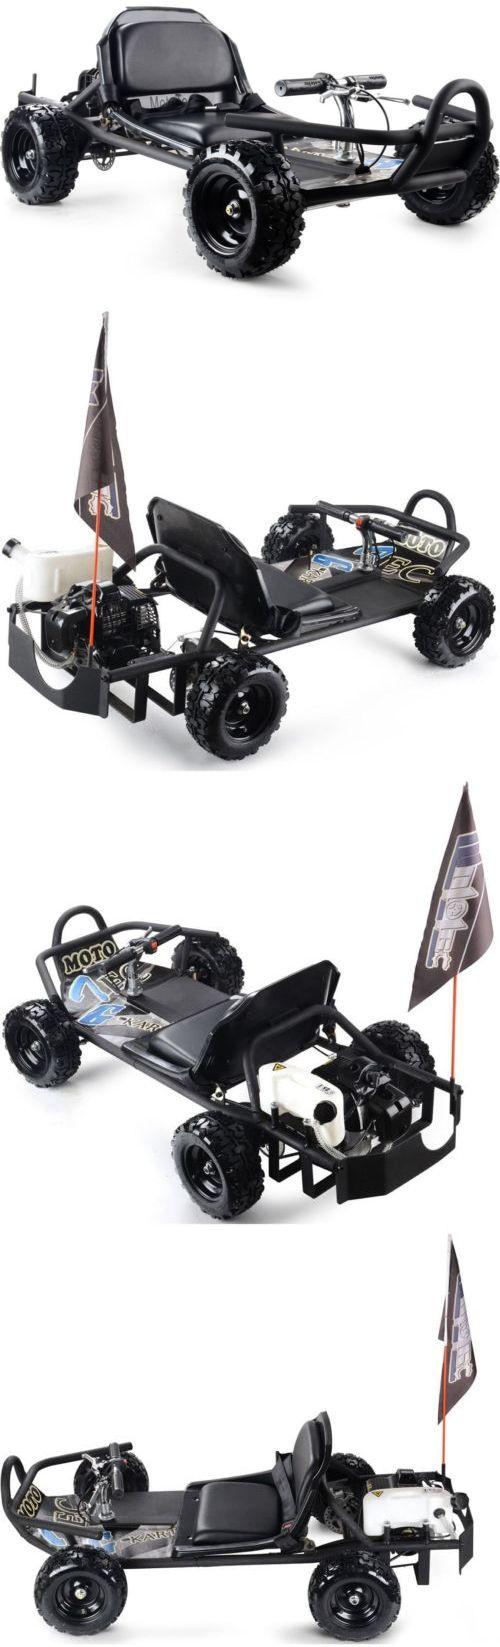 Complete Go-Karts and Frames 64656: Mototec Sandman Black 49Cc Go Kart -> BUY IT NOW ONLY: $795.52 on eBay!